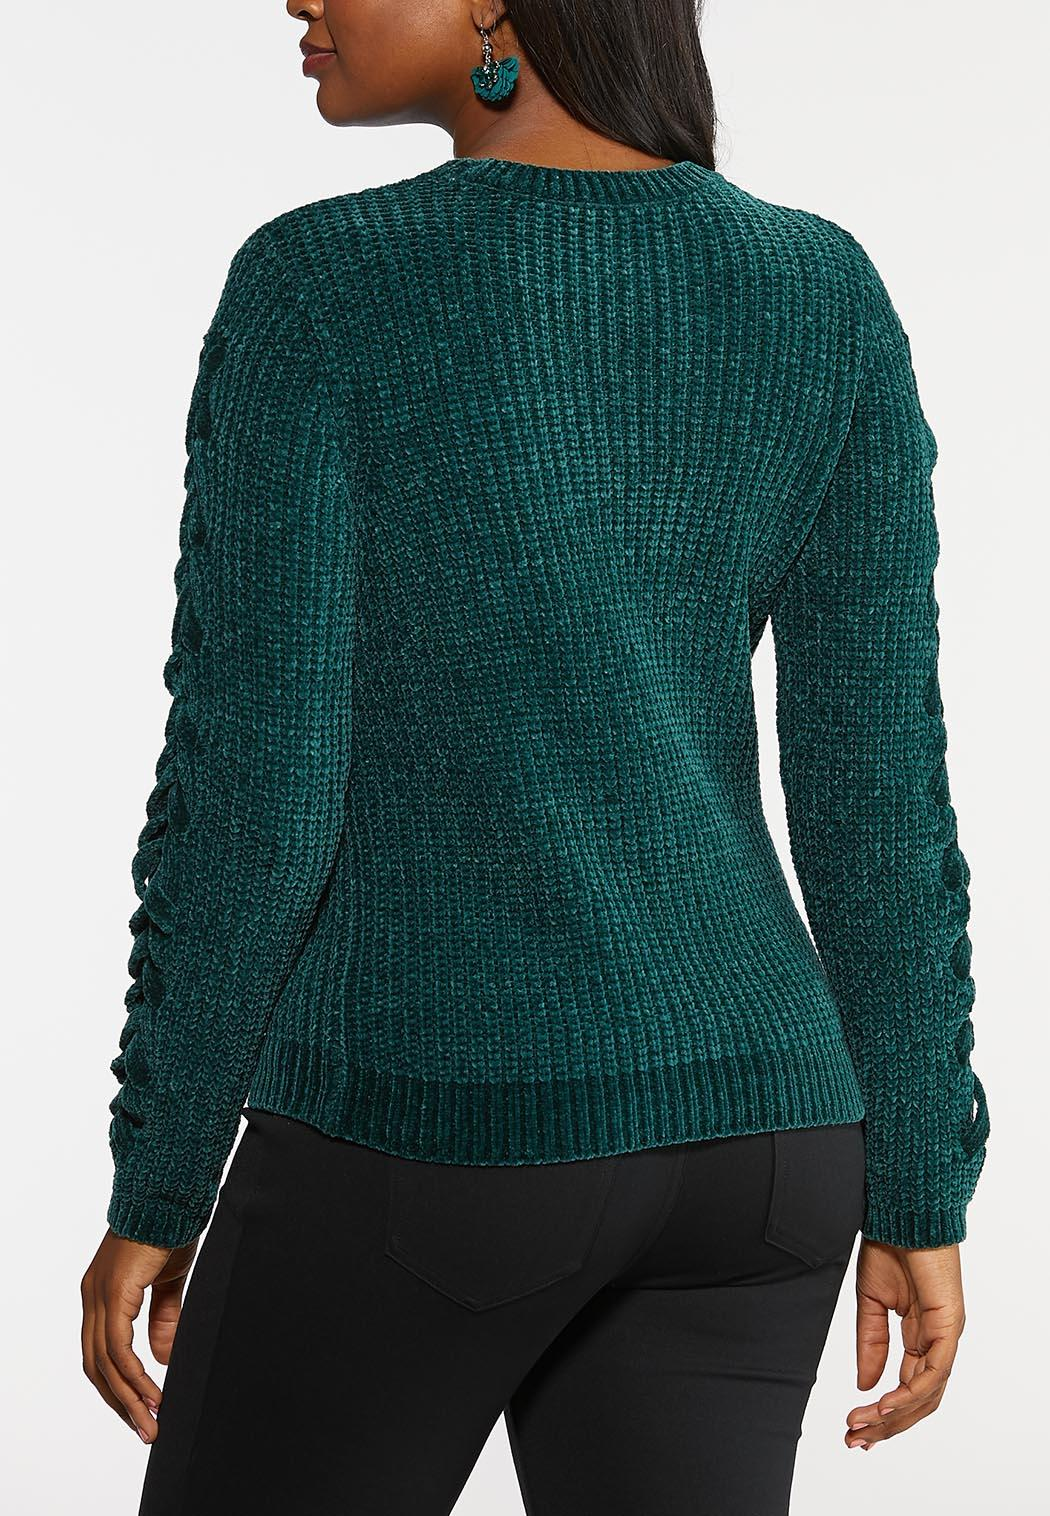 Green Chenille Sweater (Item #44026501)